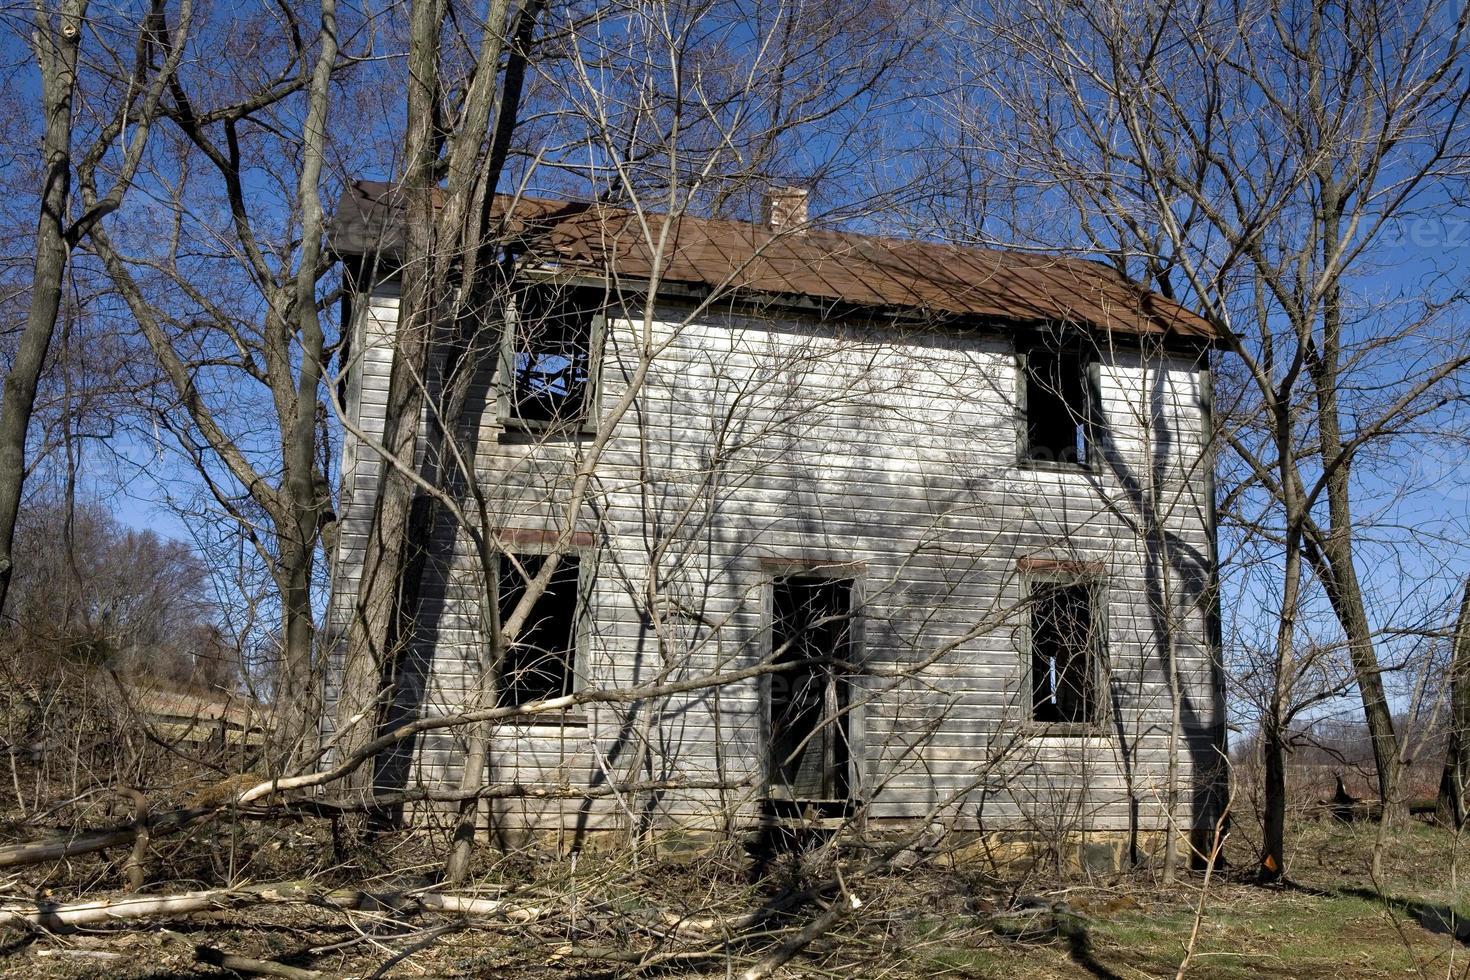 Abandoned House Rural America photo